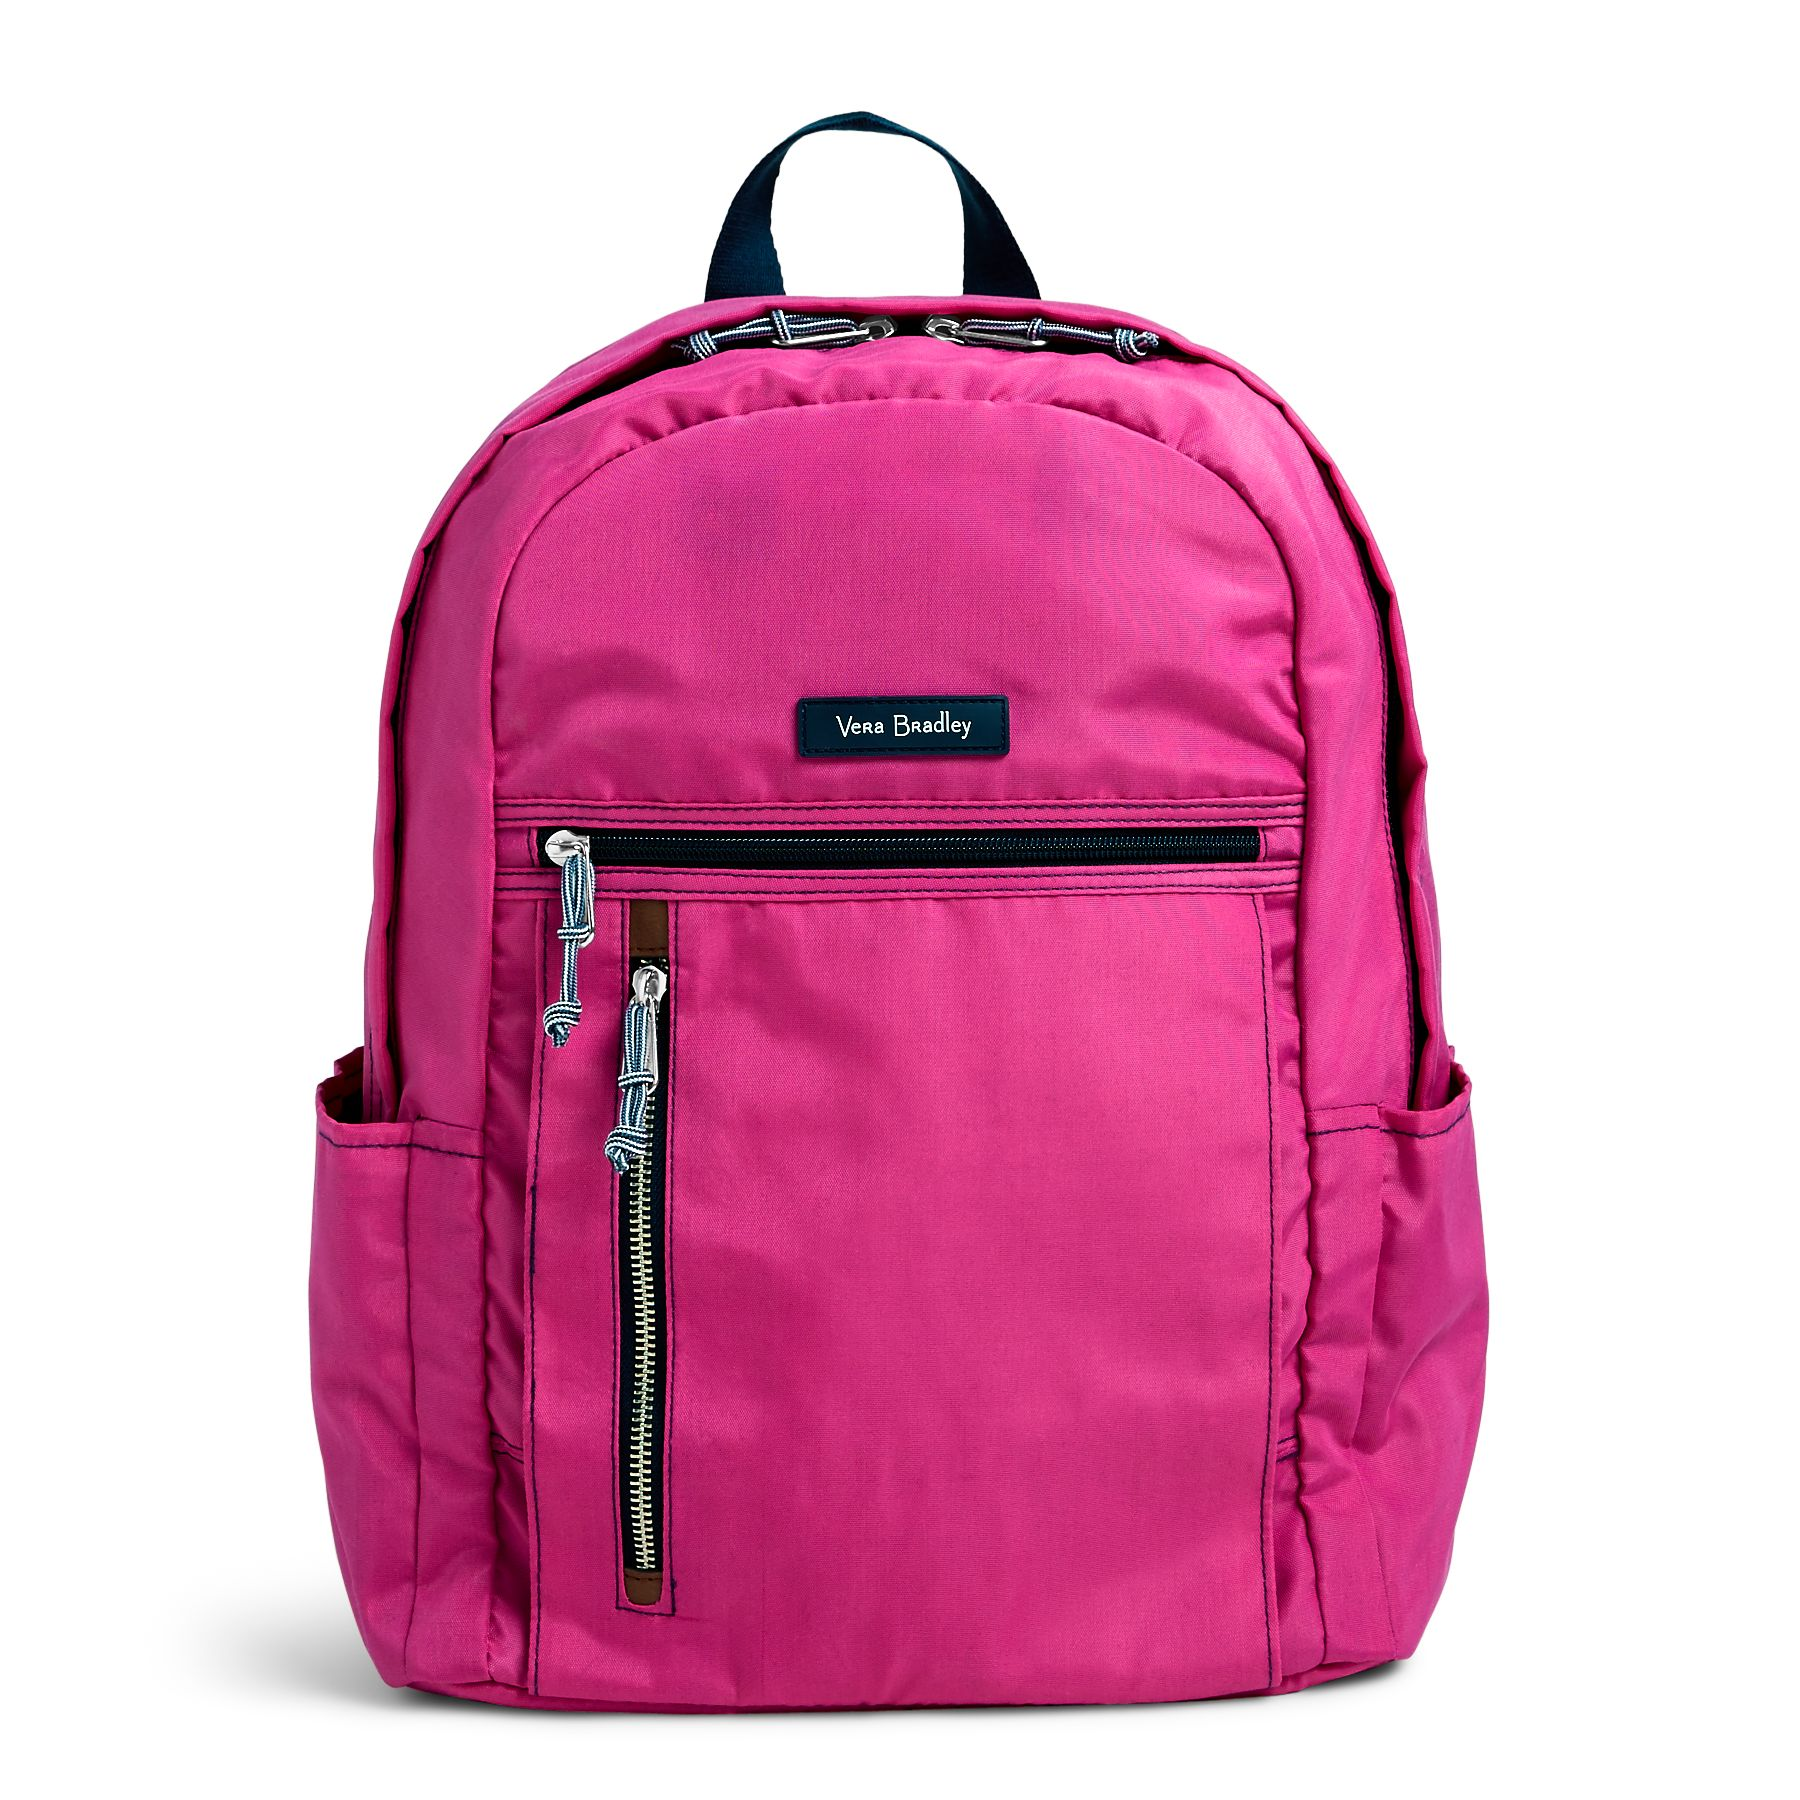 0466443b9a Vera bradley lighten up grand backpack at 6pm.com